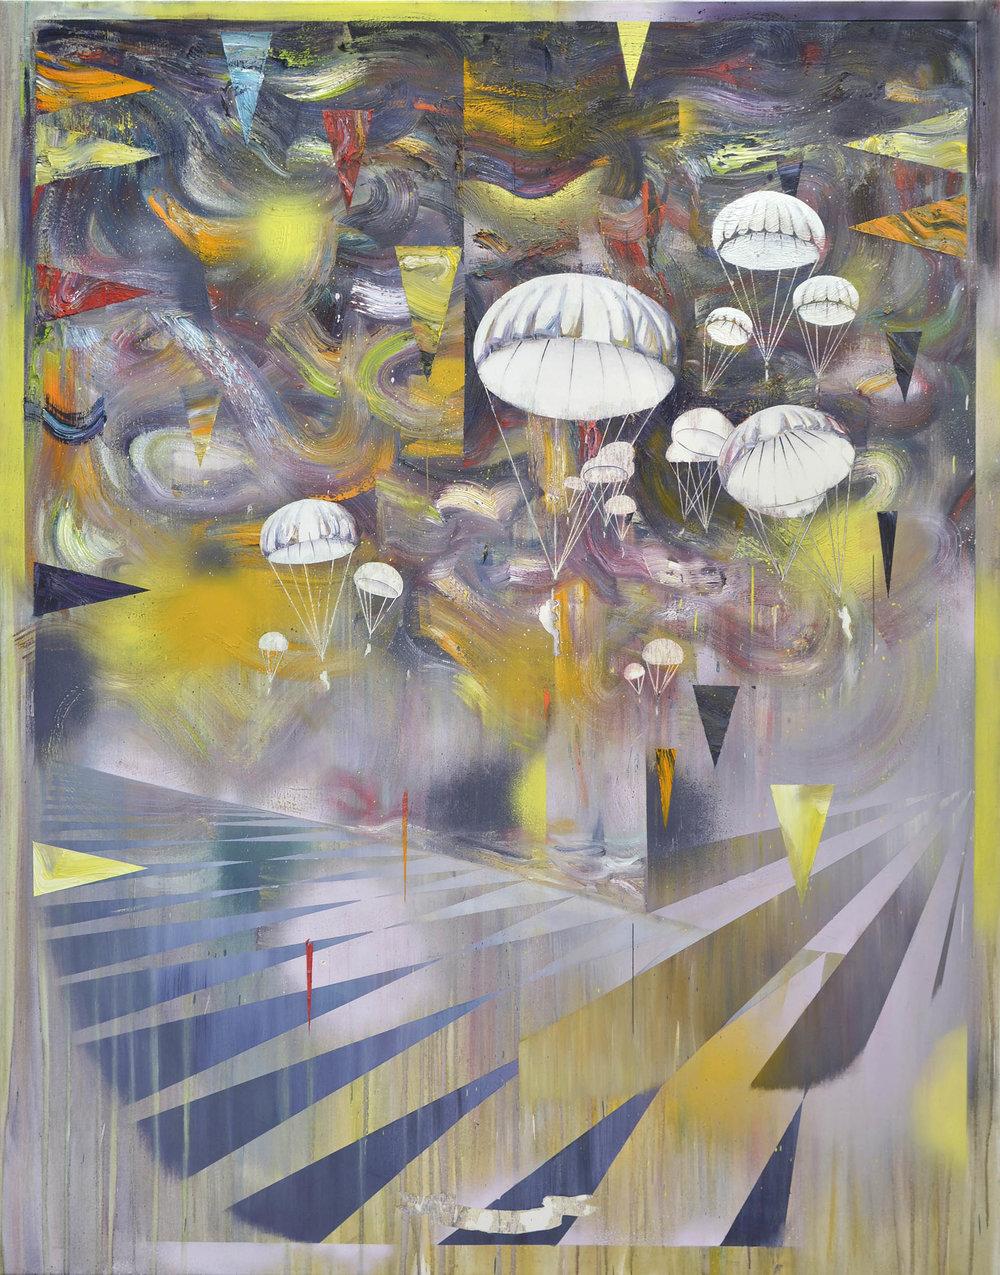 Matthias Moravek %22 Landung%22, Öl,Lack auf Leinwand, 190 x 165 cm, 2016.jpg